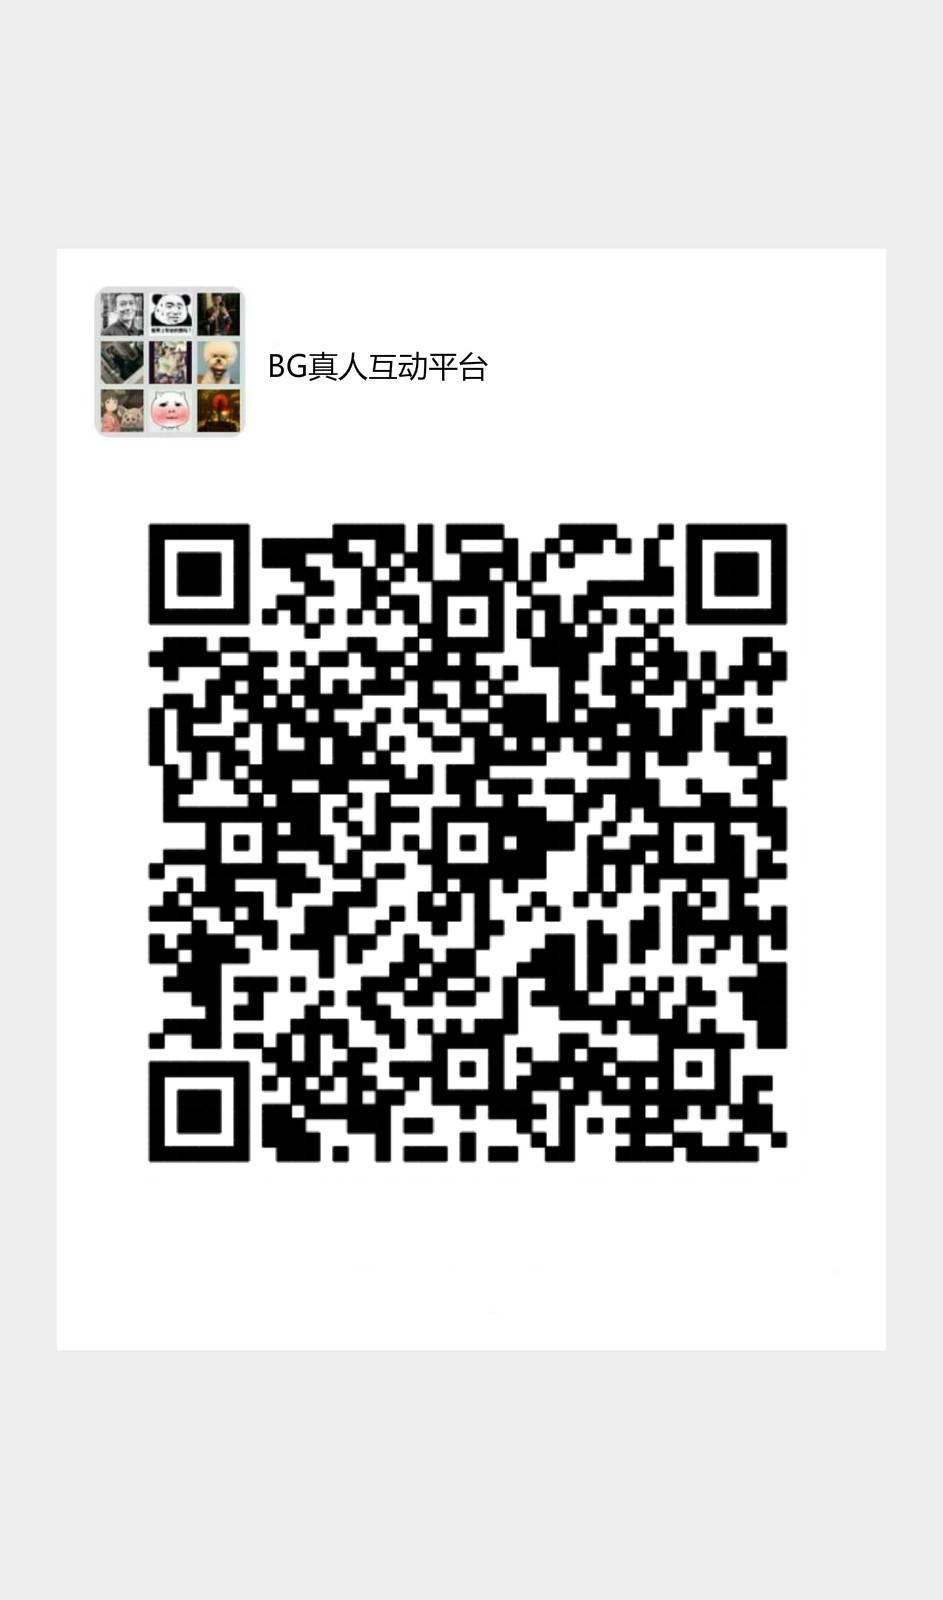 5gm真人互动平台